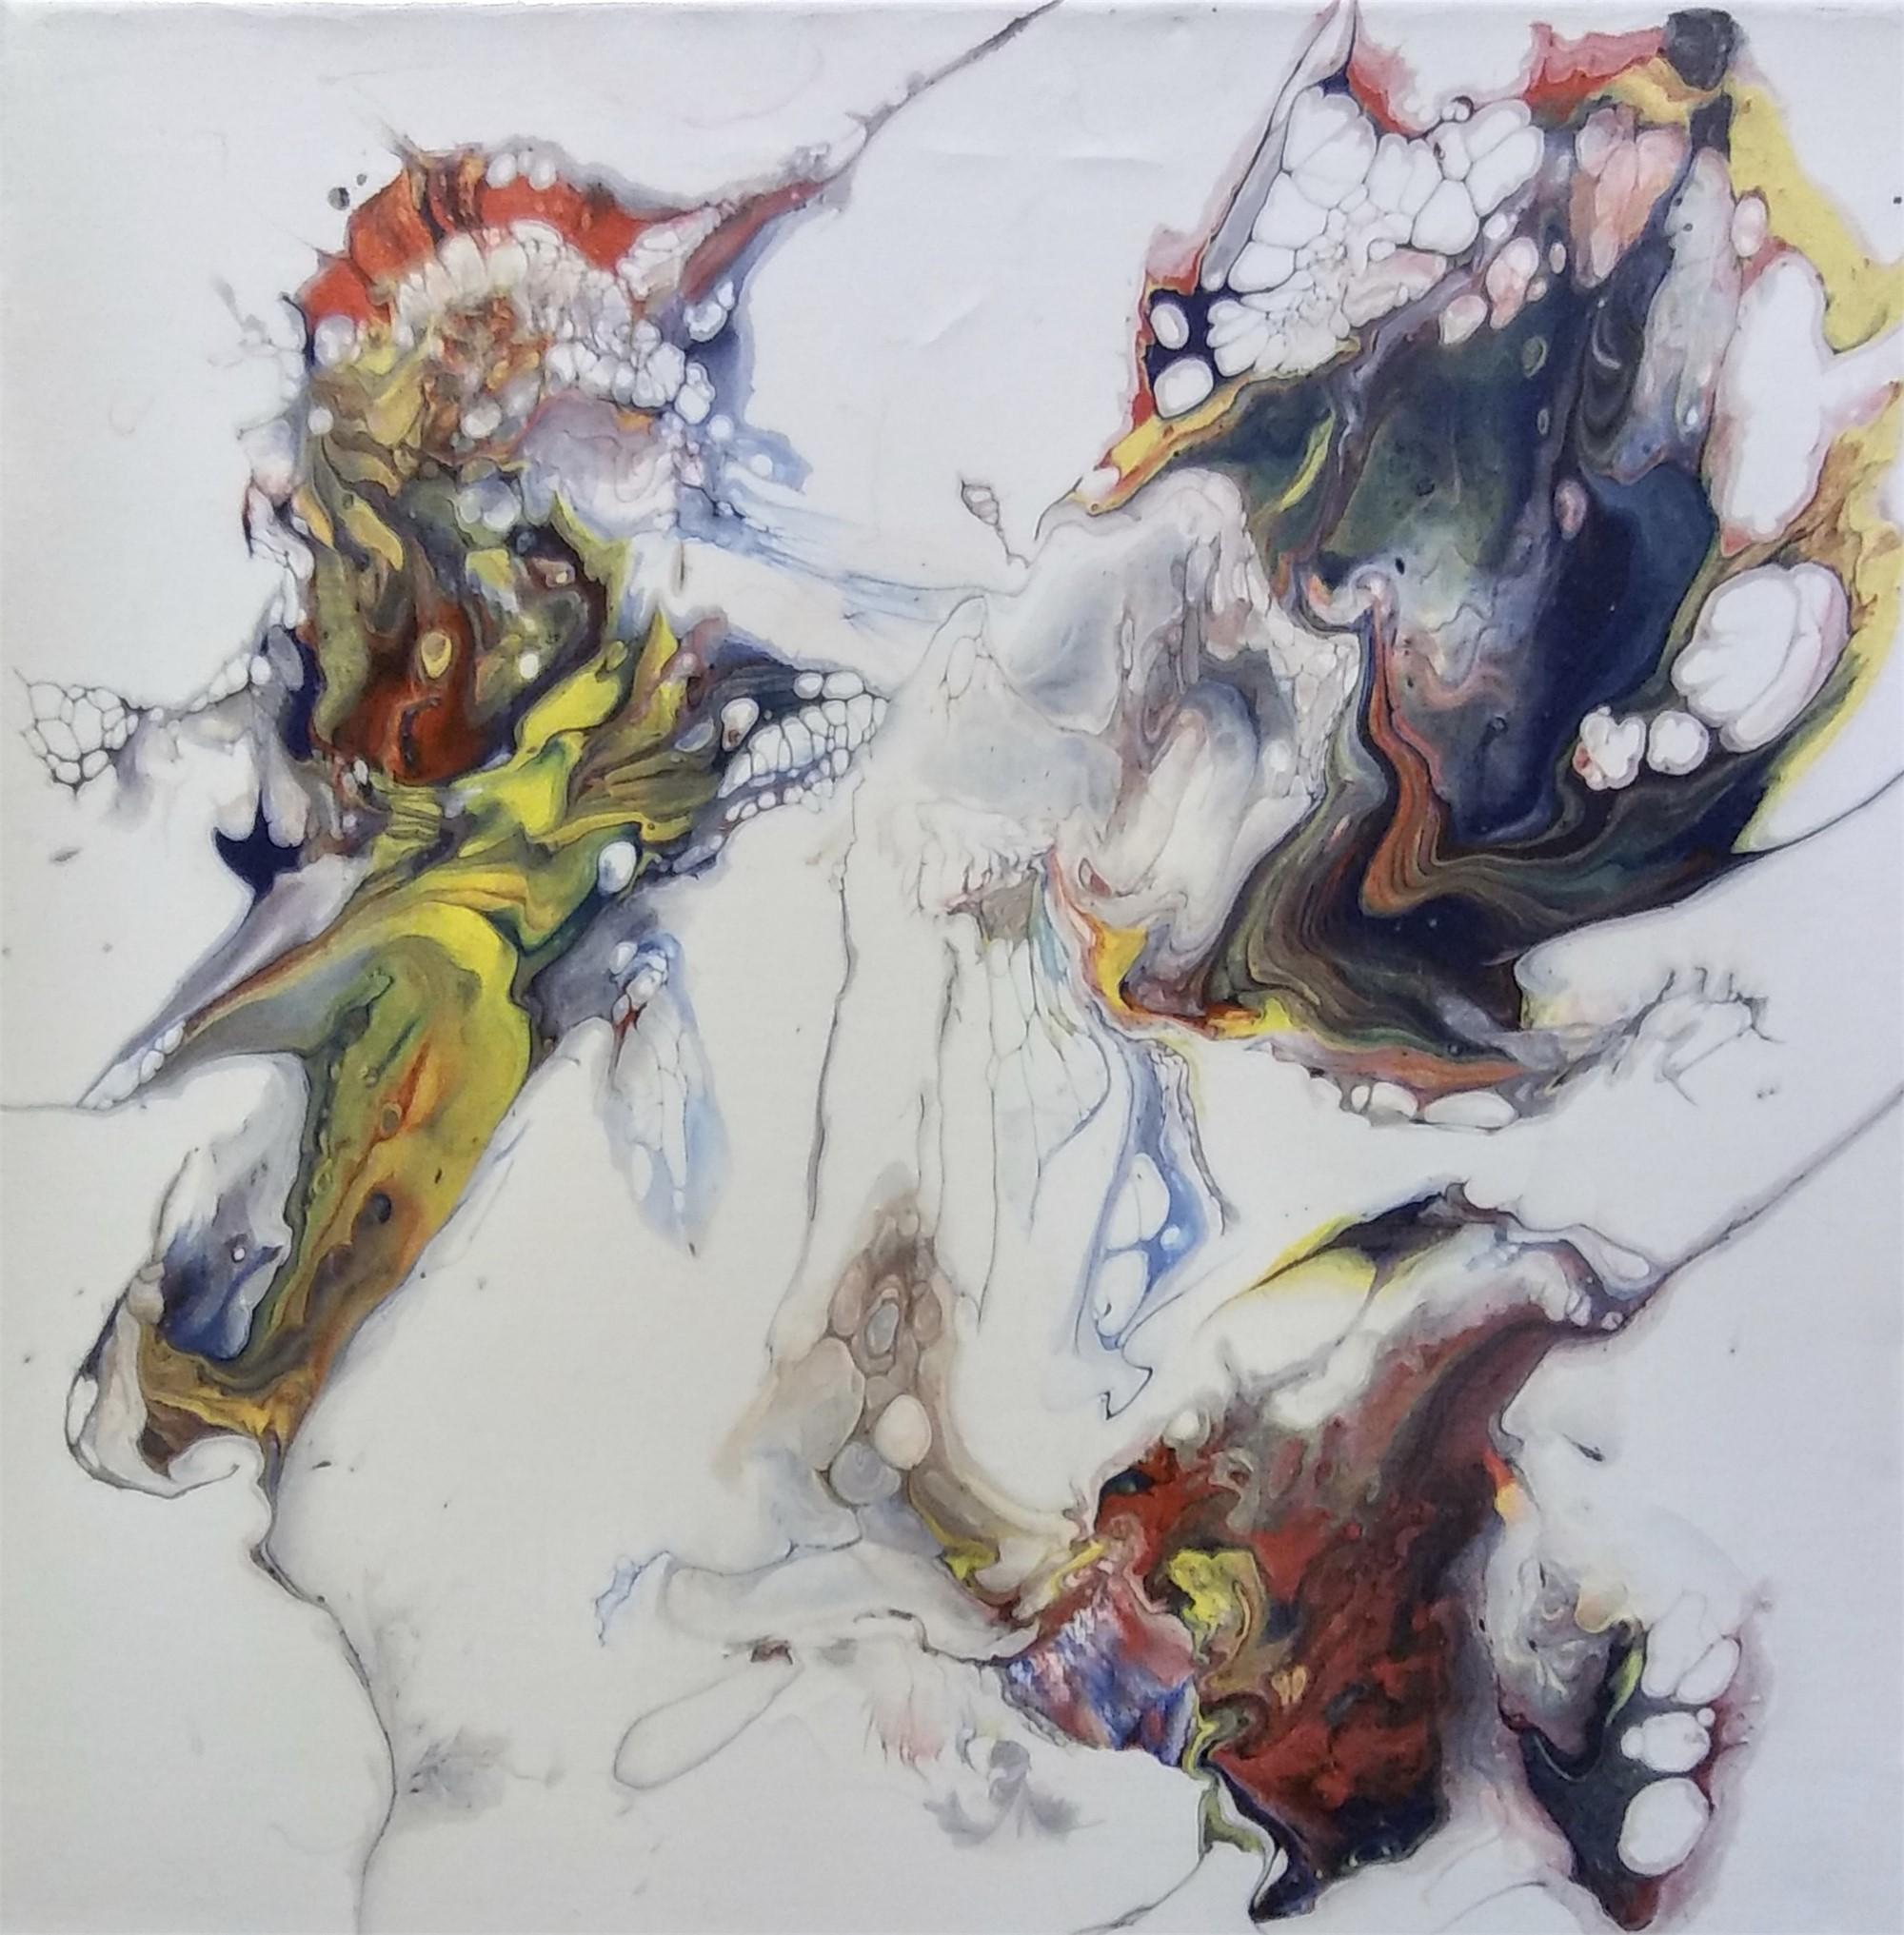 Unicorn by June Hormel (Newberg, OR)